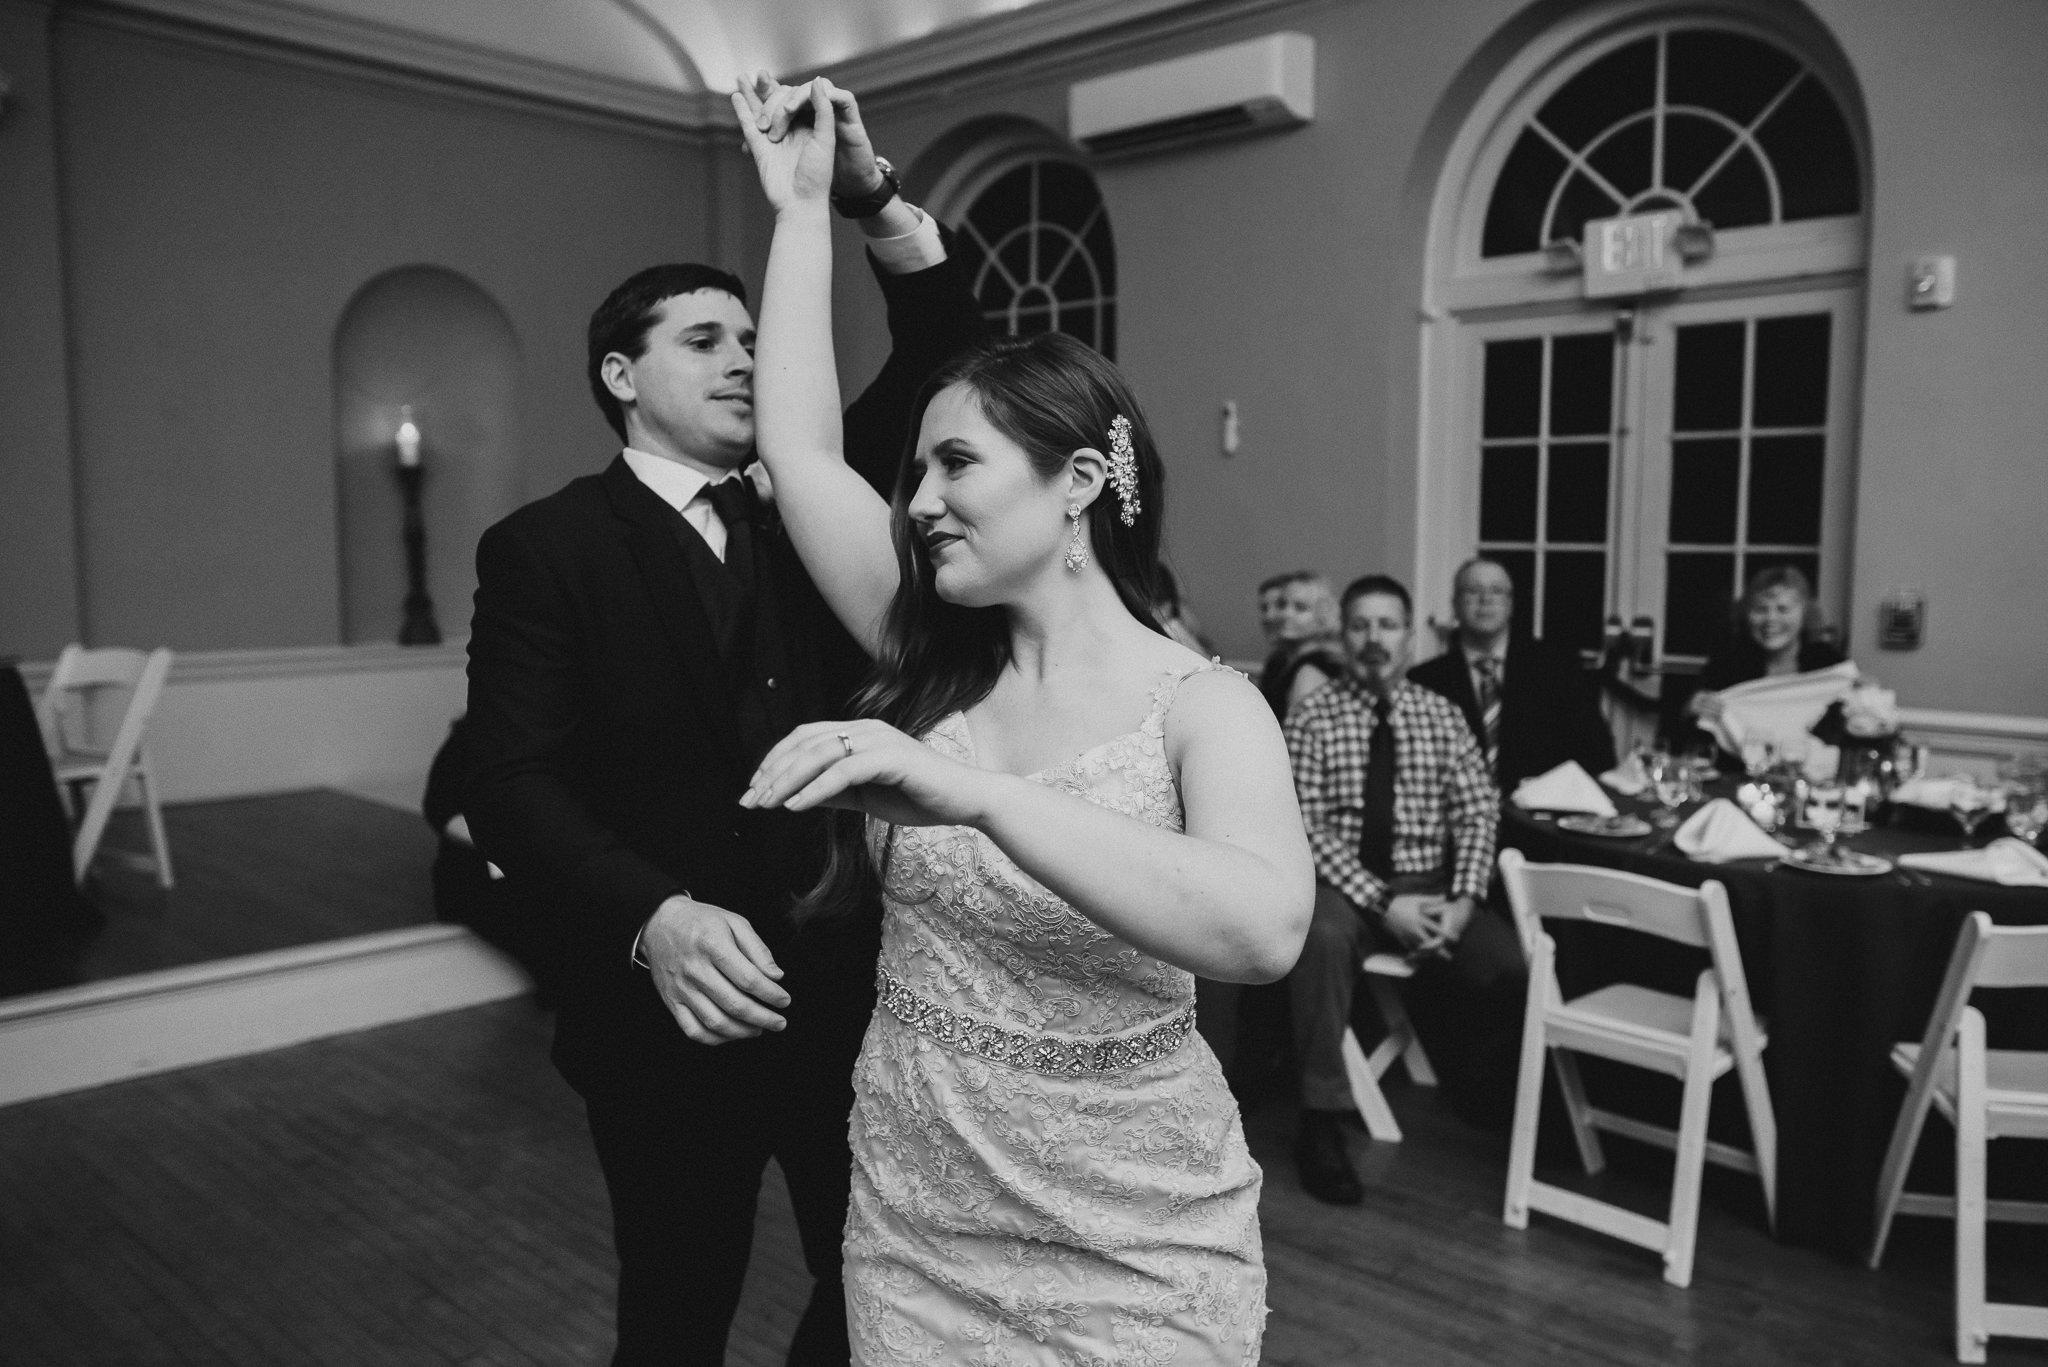 Colonial_Dames_Society_Wedding-0052.jpg